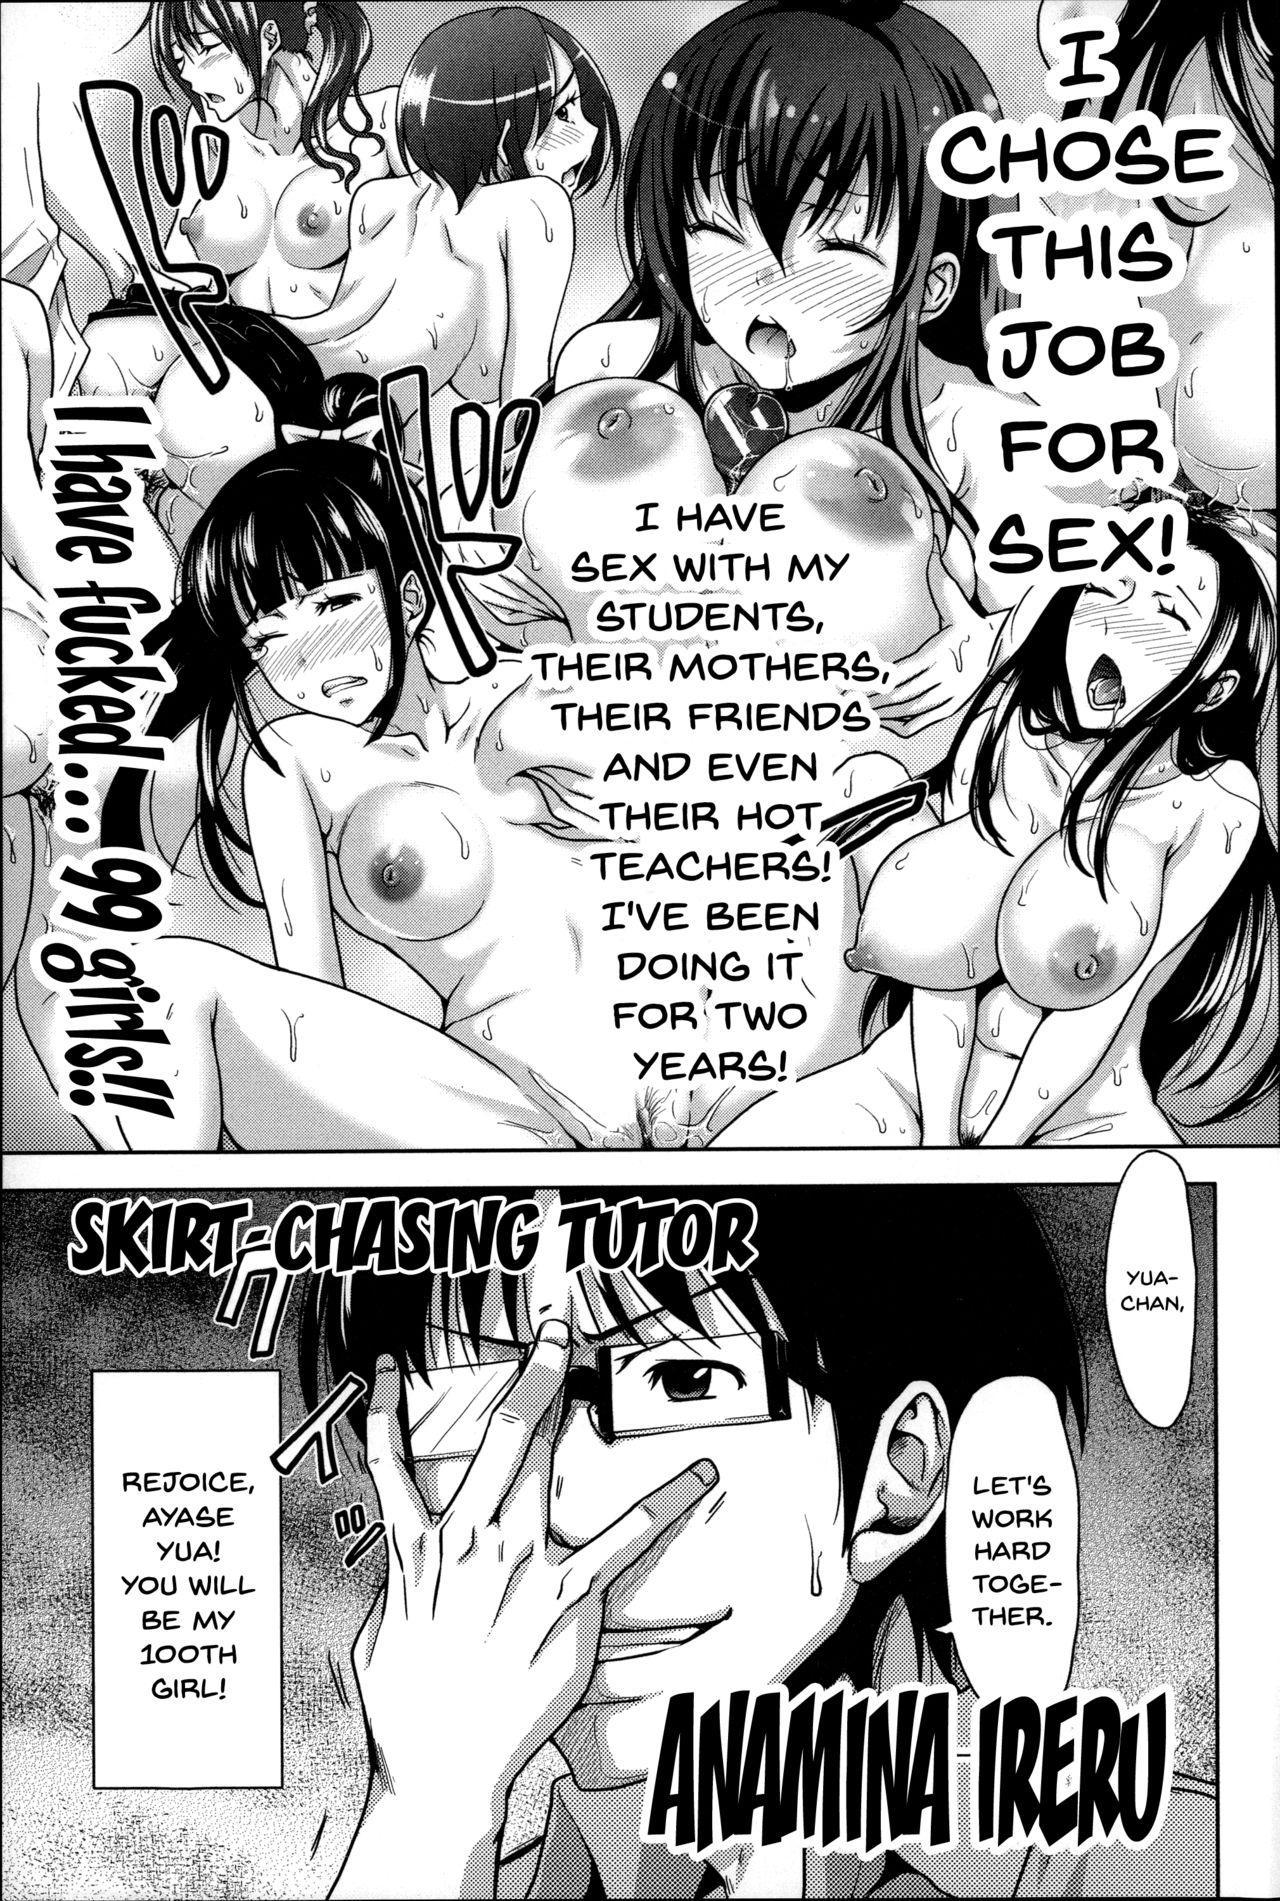 [Takuwan] Pakotate! Seikouritsu 0% no Teppeki Bishojo VS Seikouritsu 100% no Hentai Katei Kyoushi   Pakotate! Sex Rate 0% Iron-Willed Beautiful Virgins VS Sex Rate 100% Perverted Coach Ch.1-5 [English] {Doujins.com} 10